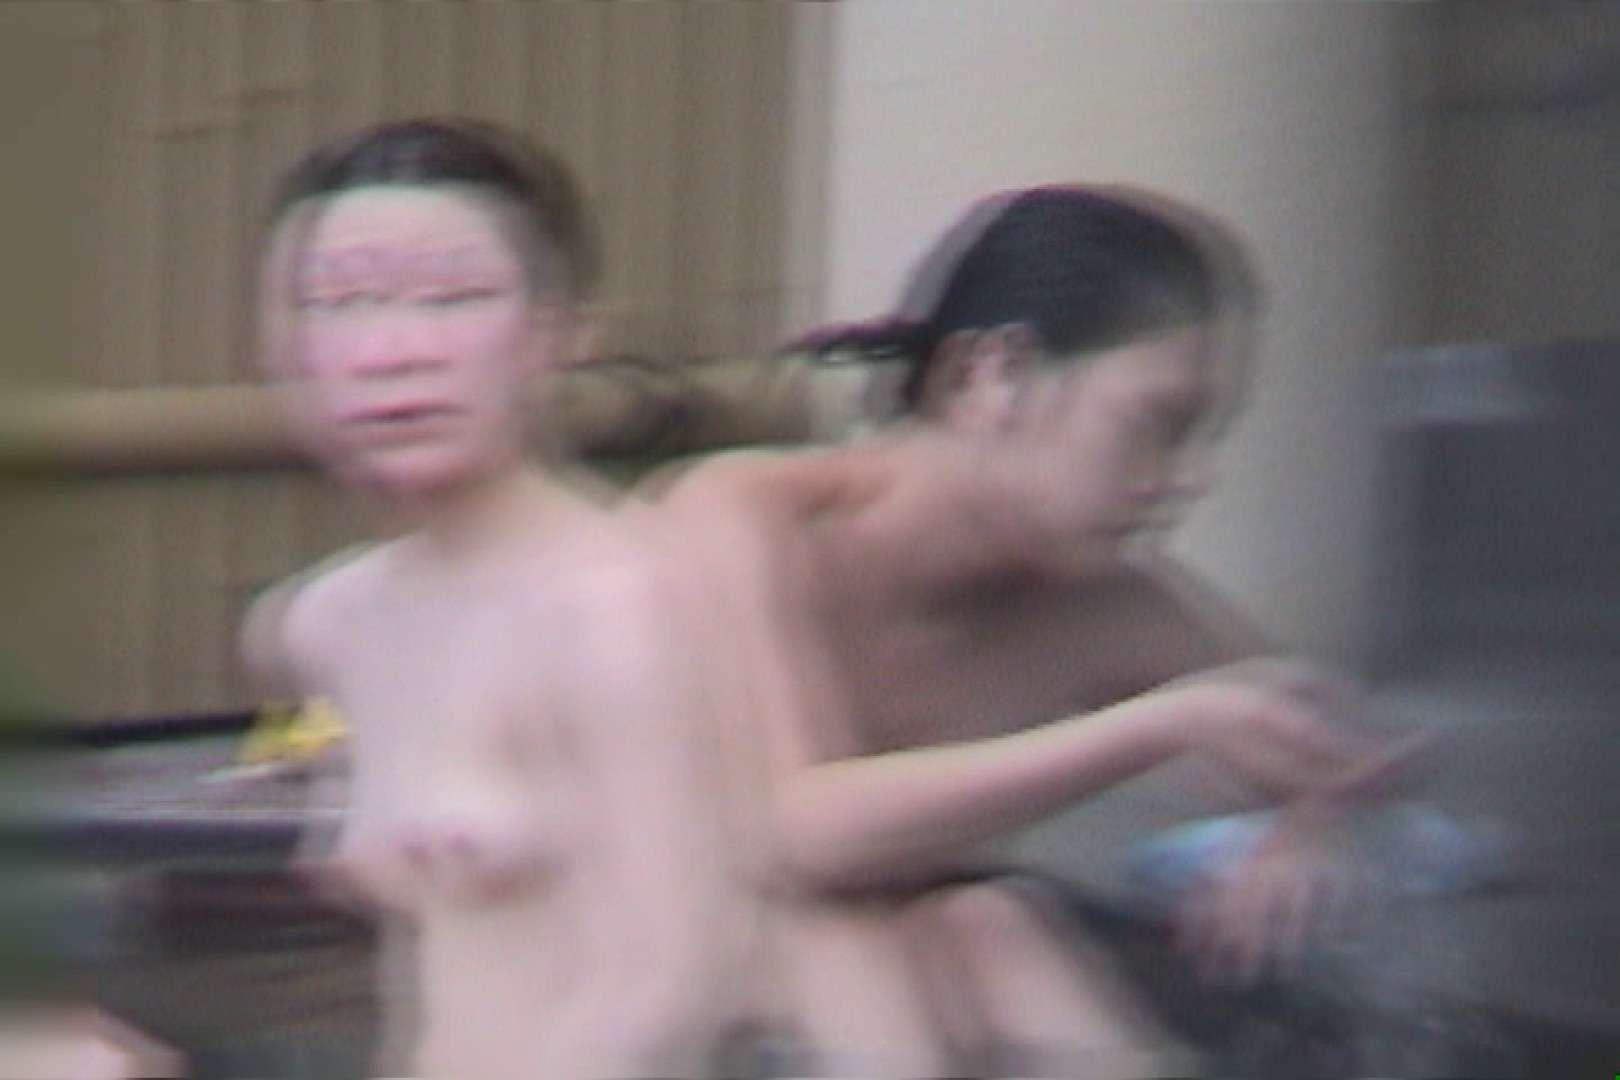 Aquaな露天風呂Vol.599 盗撮シリーズ   露天風呂編  93PIX 5